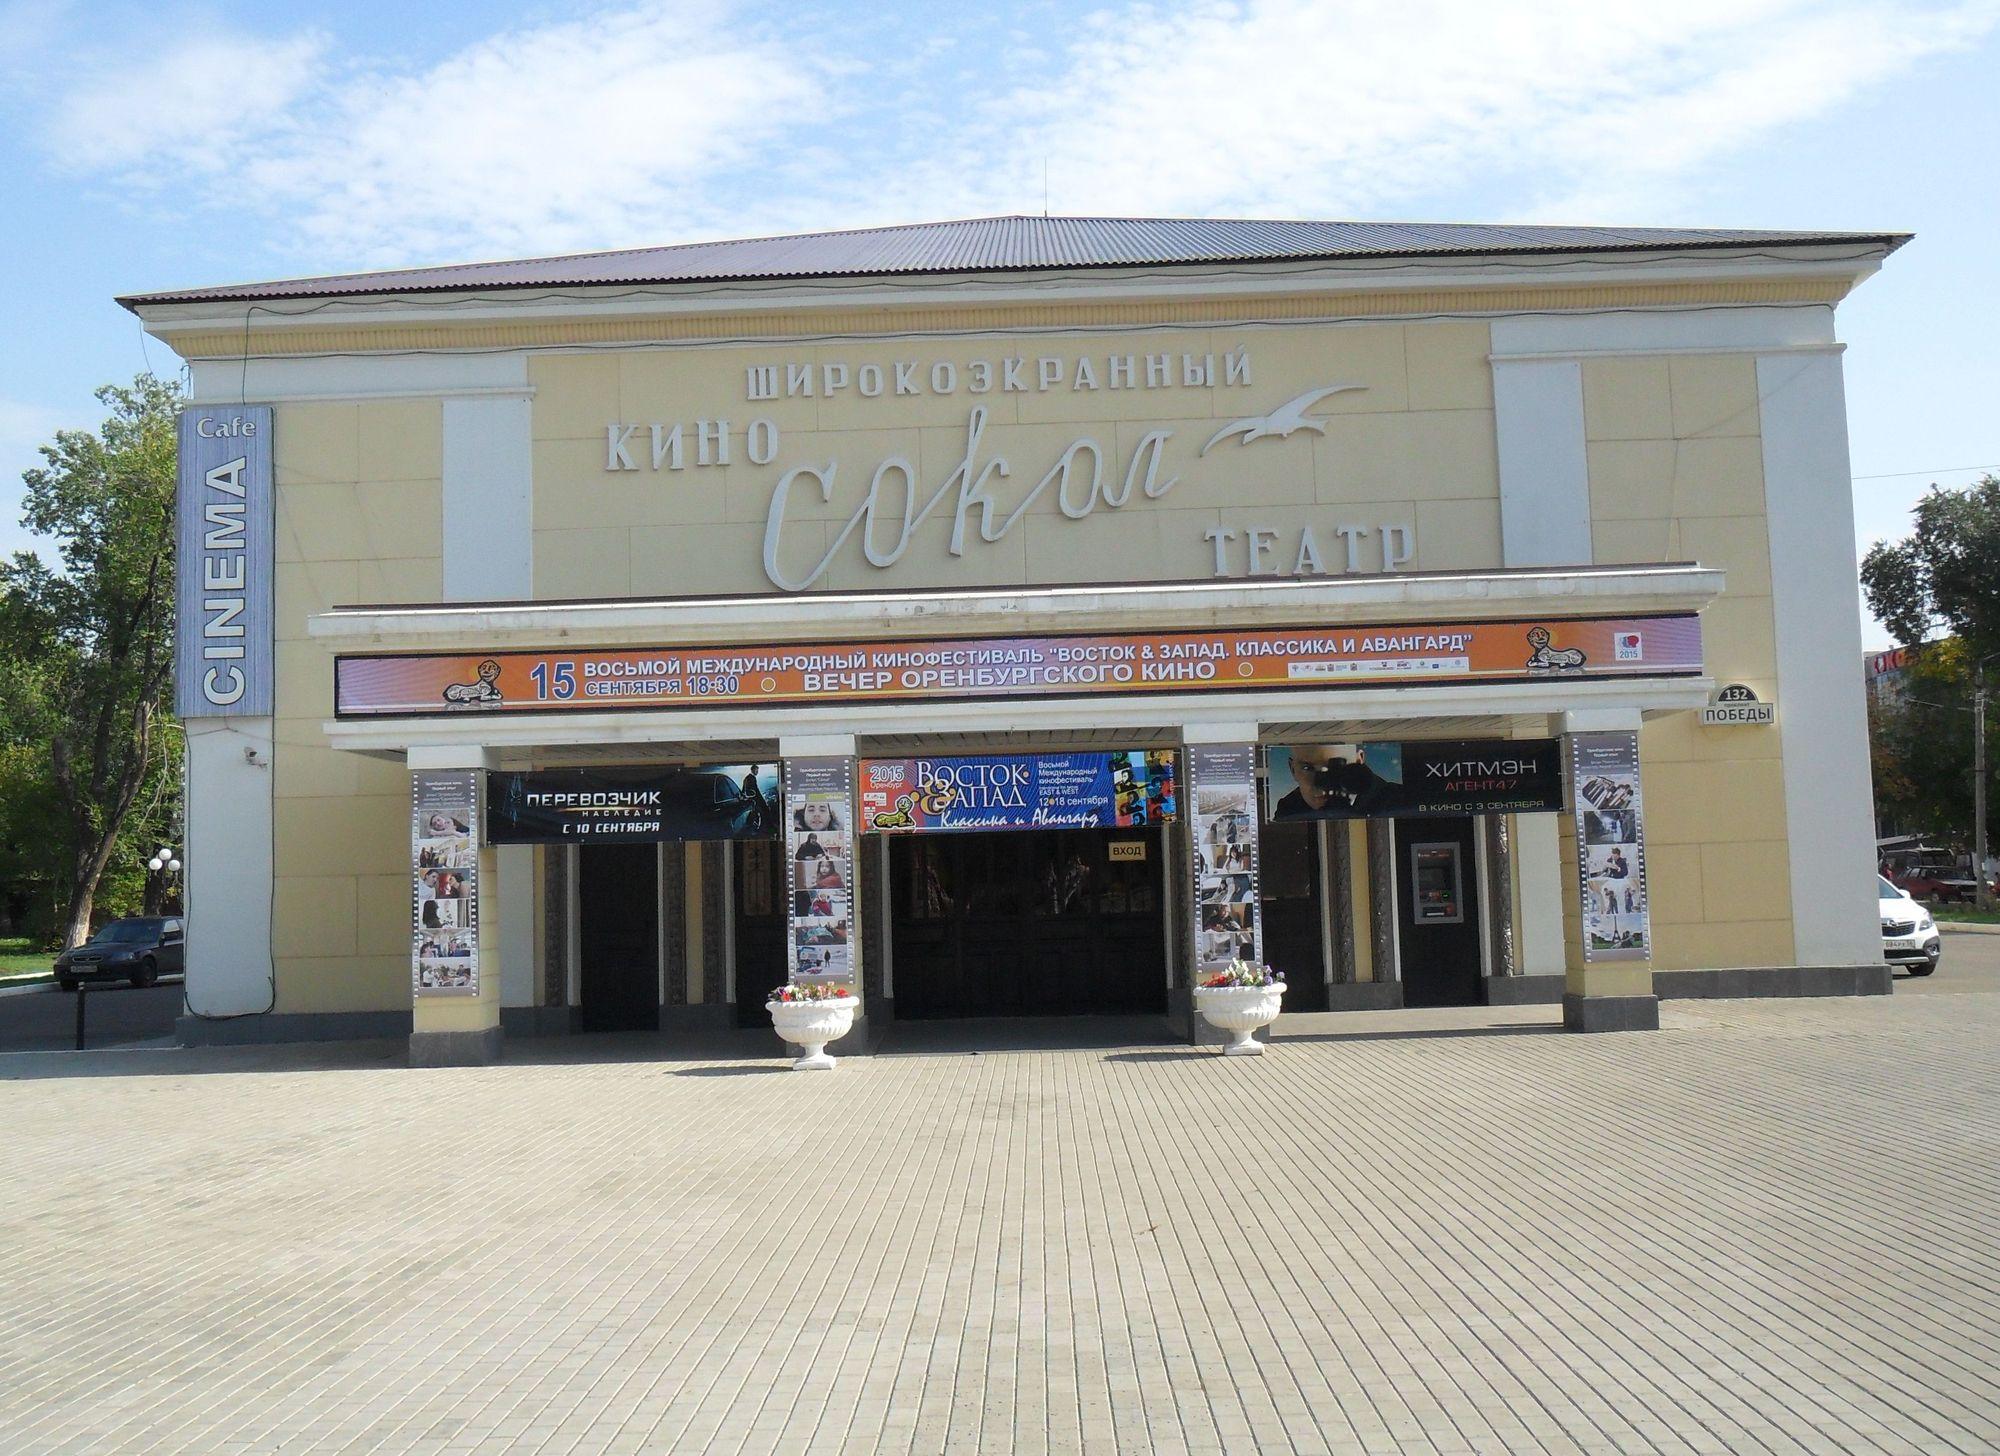 Кинотеатр Сокол